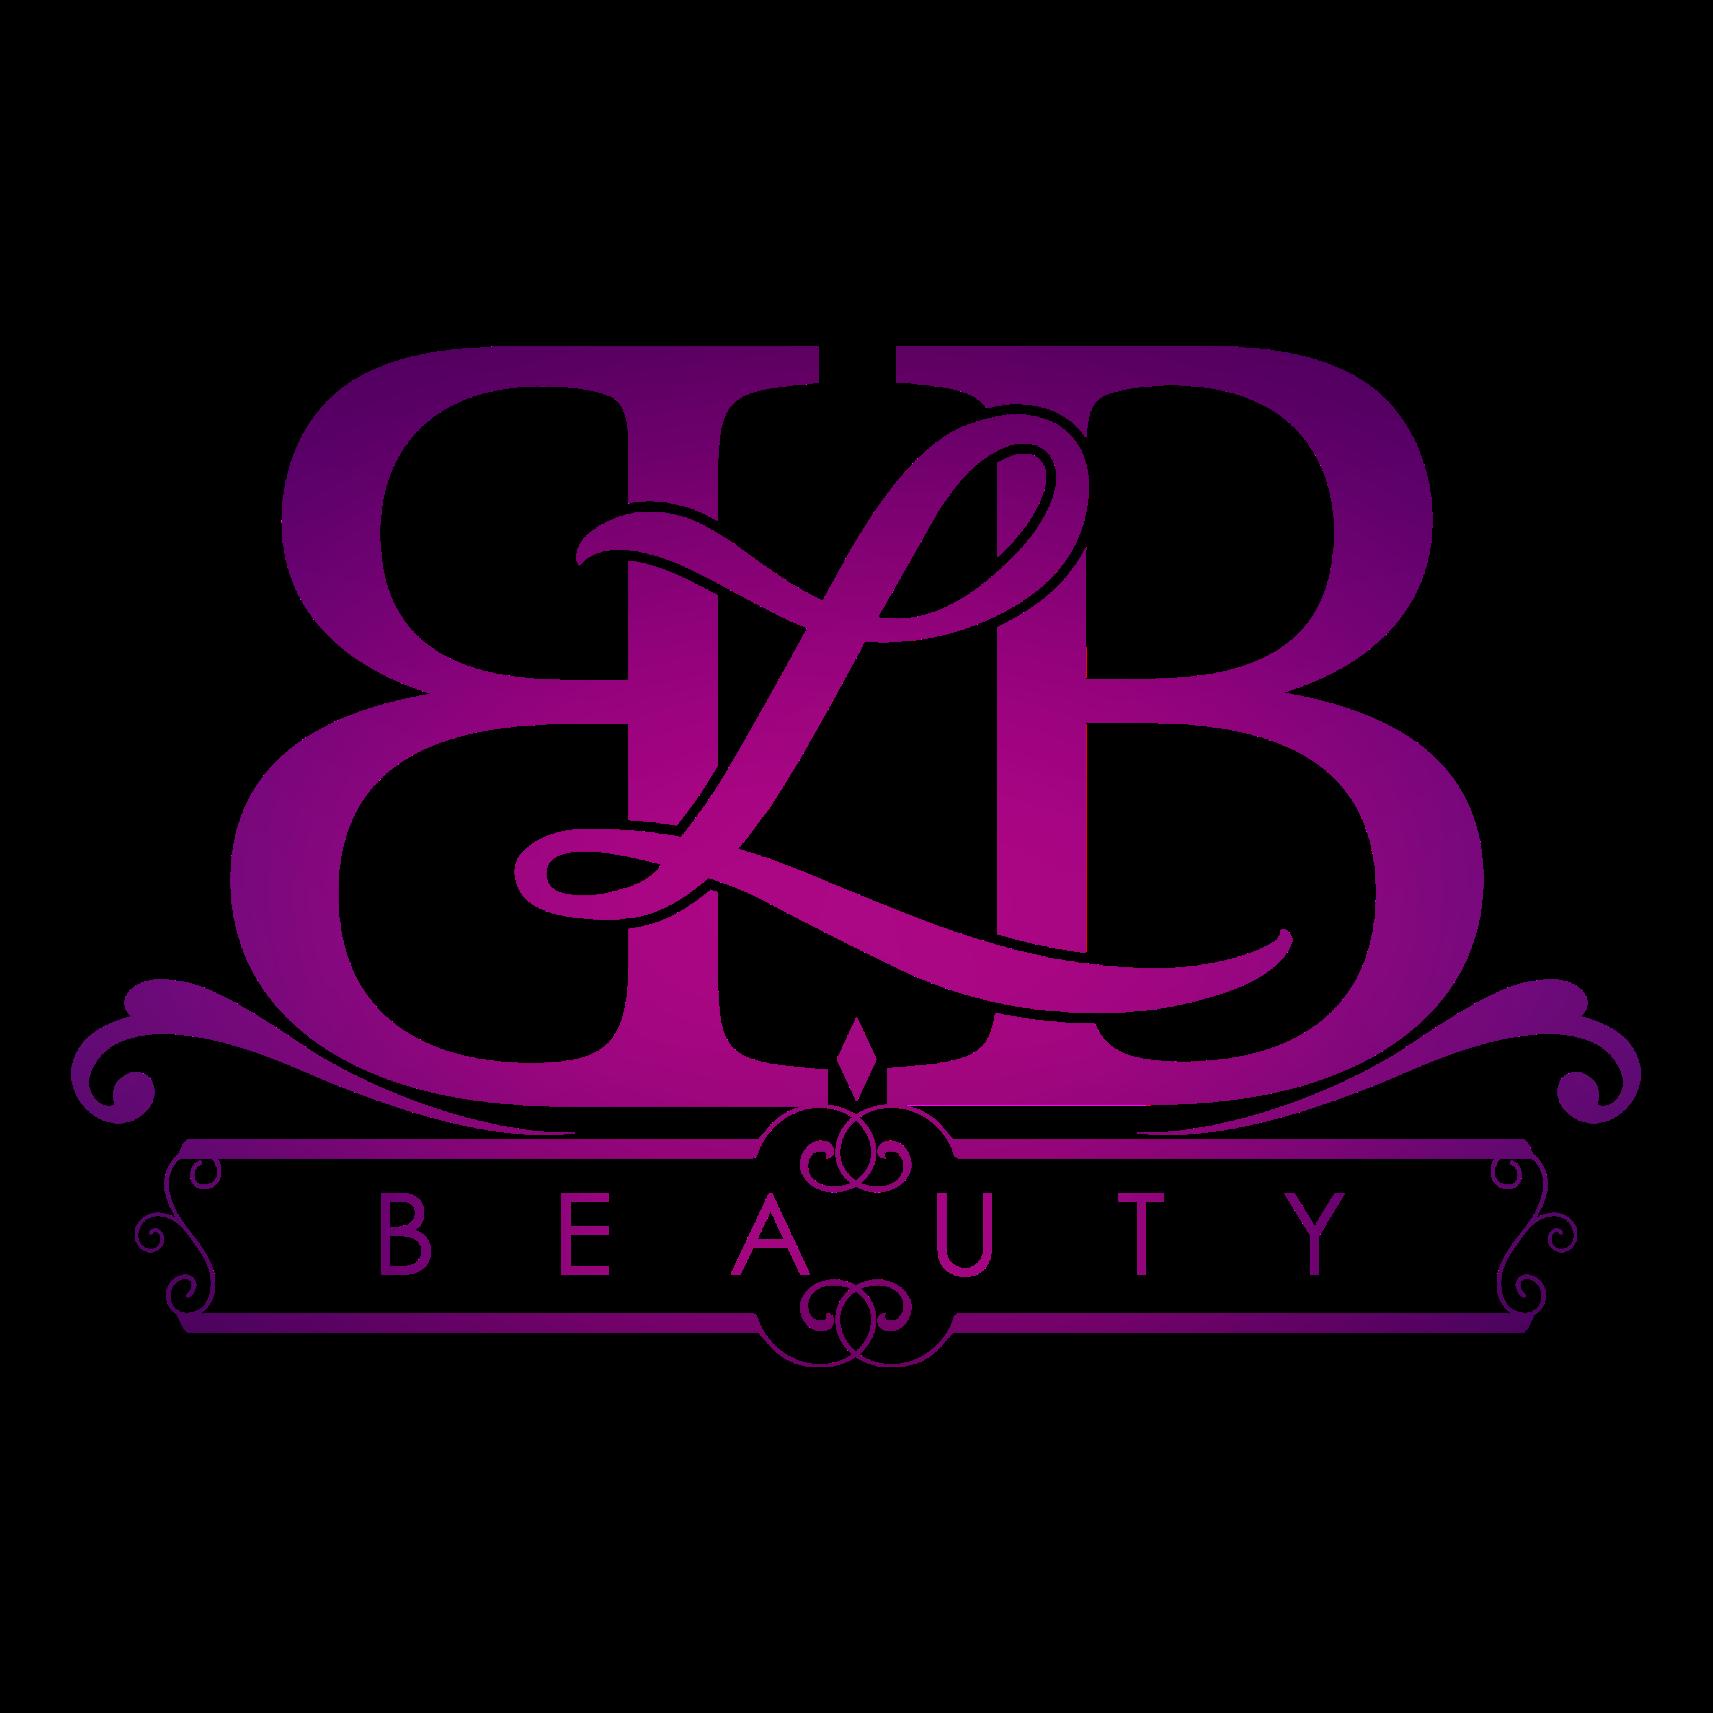 BBL BEAUTY[1855]_edited